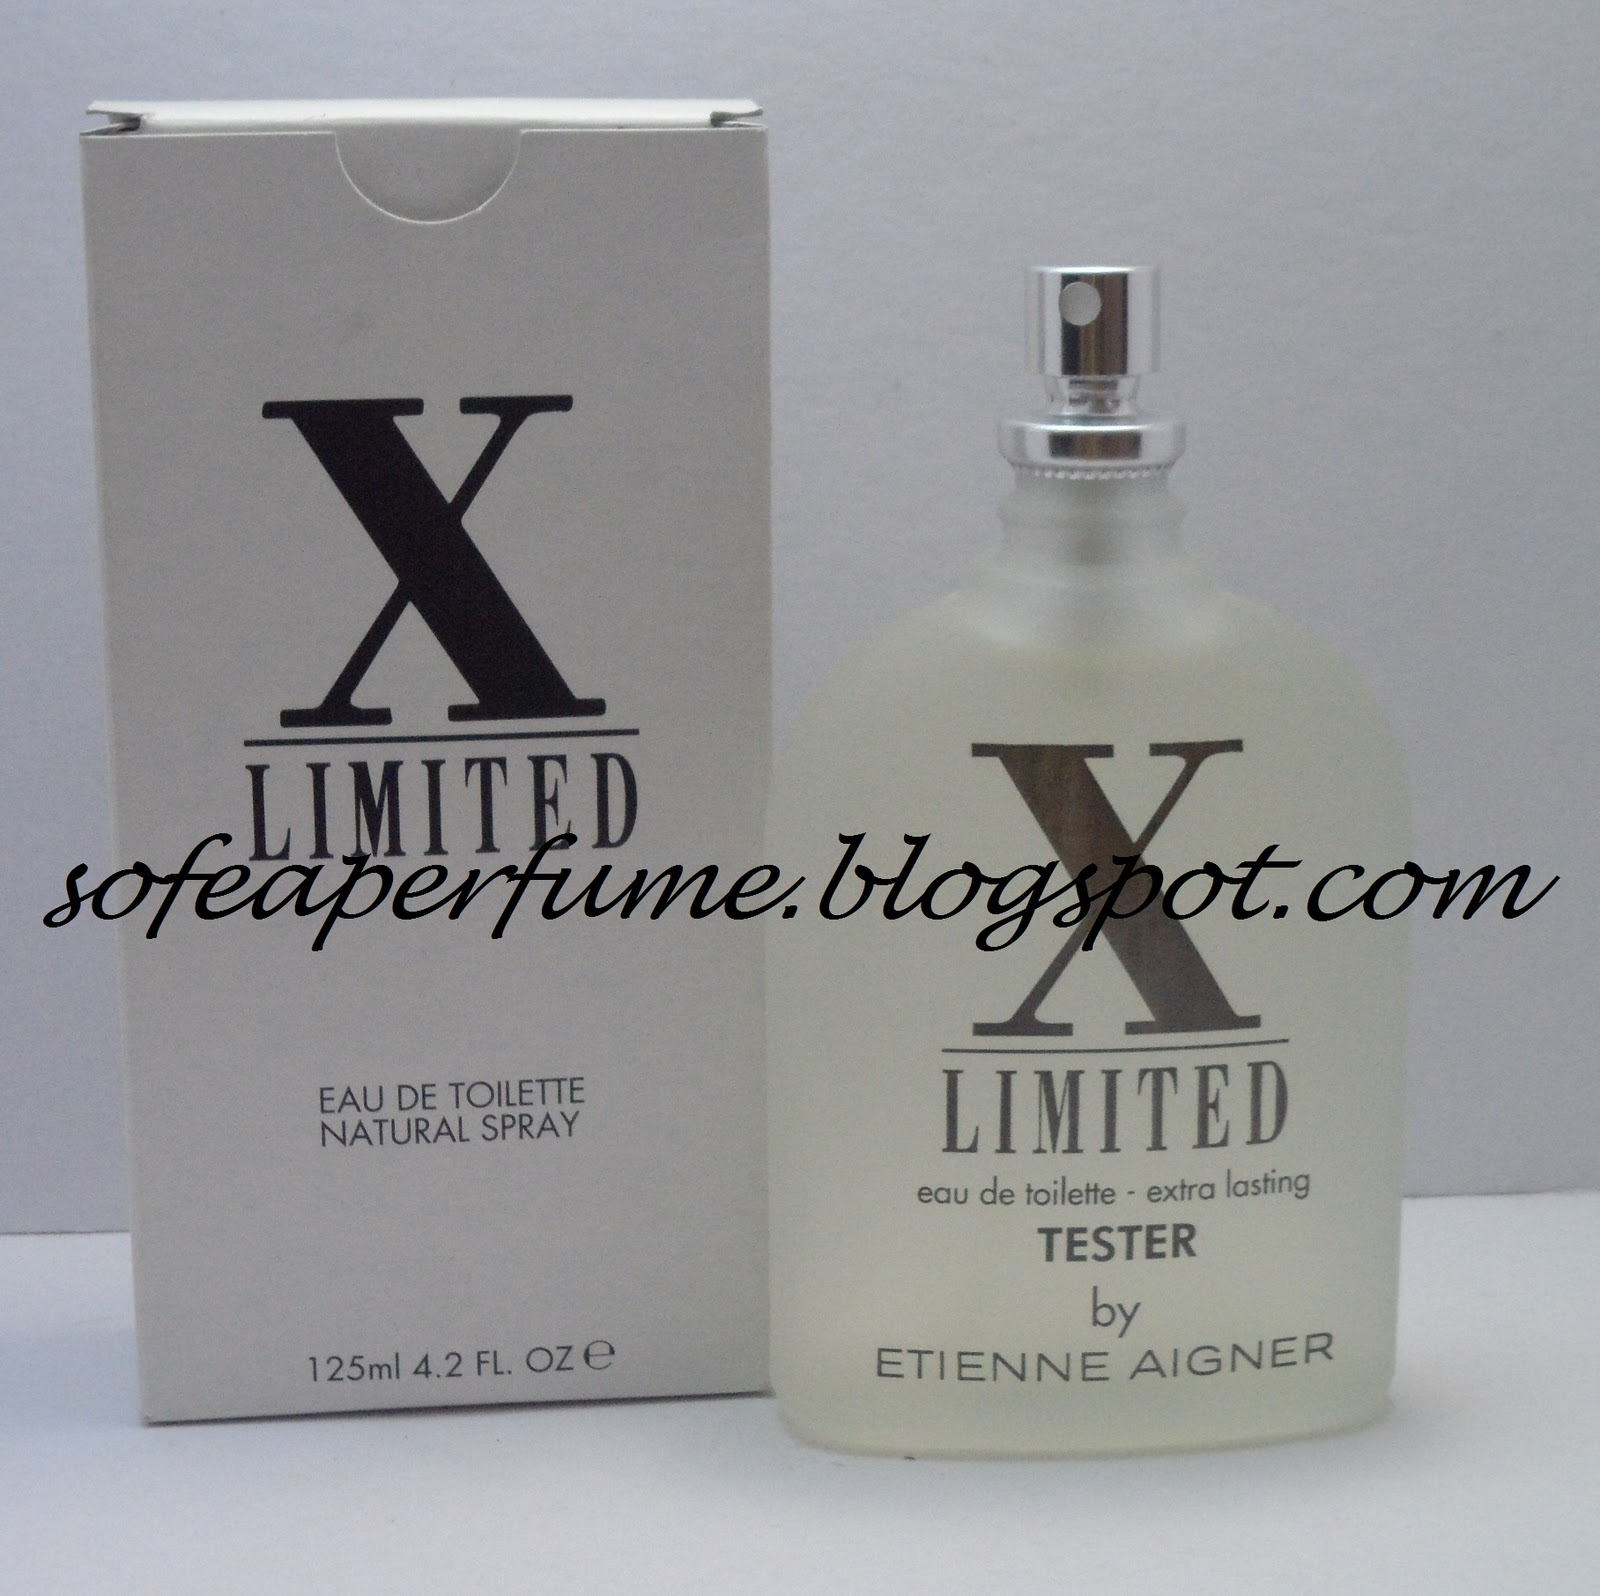 Harga Etienne Aigner Pour Homme 100 Ml Original Non Box Terbaru 2018 Ubercaren 0025 Brown Sofea Perfume X Limited By Men Edt